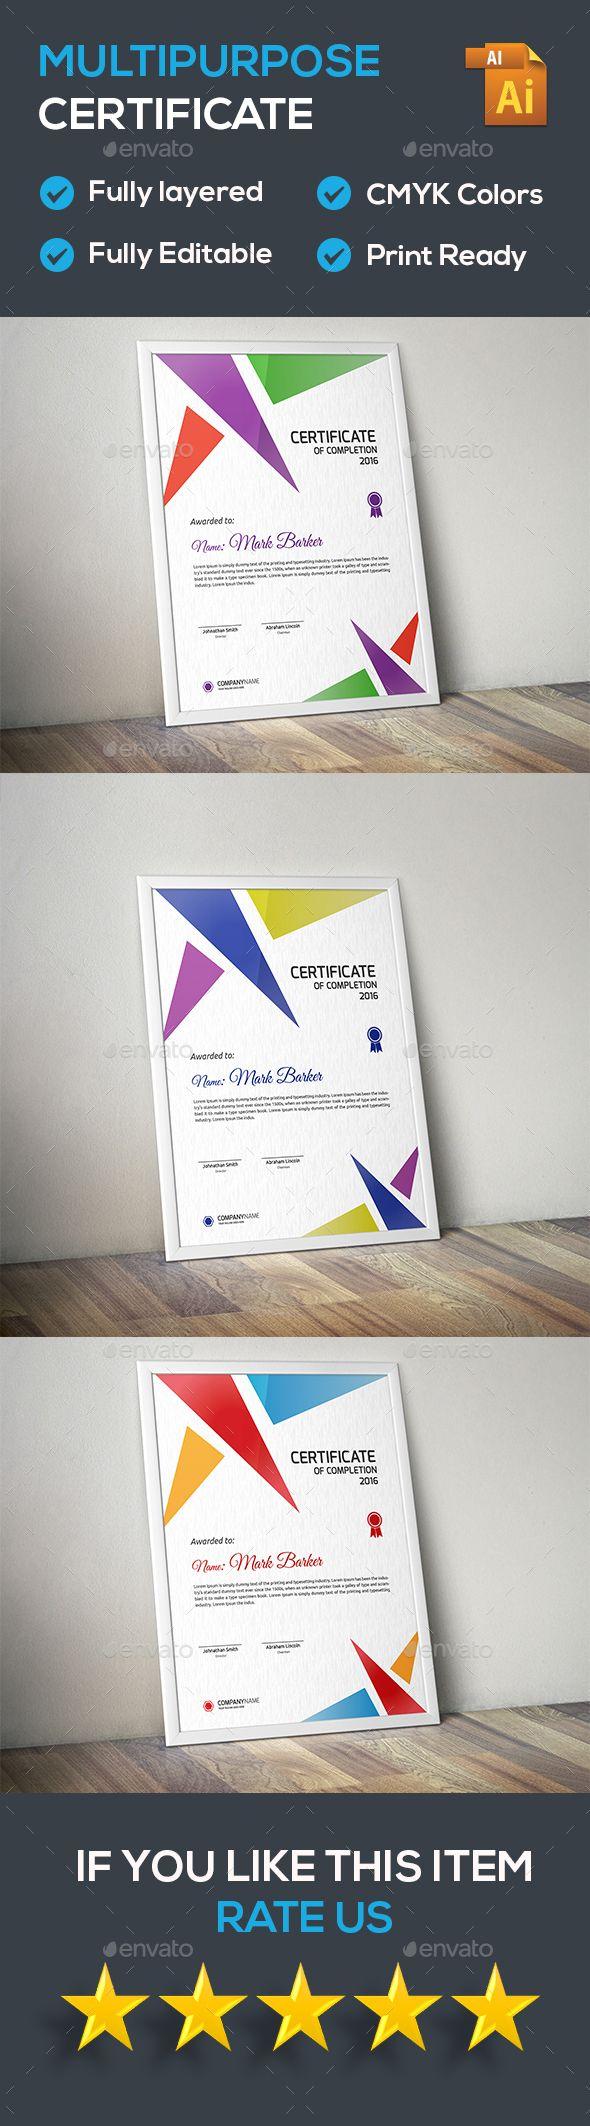 Certificate Template Vector EPS. Download here: https://graphicriver.net/item/certificate/16858405?ref=ksioks